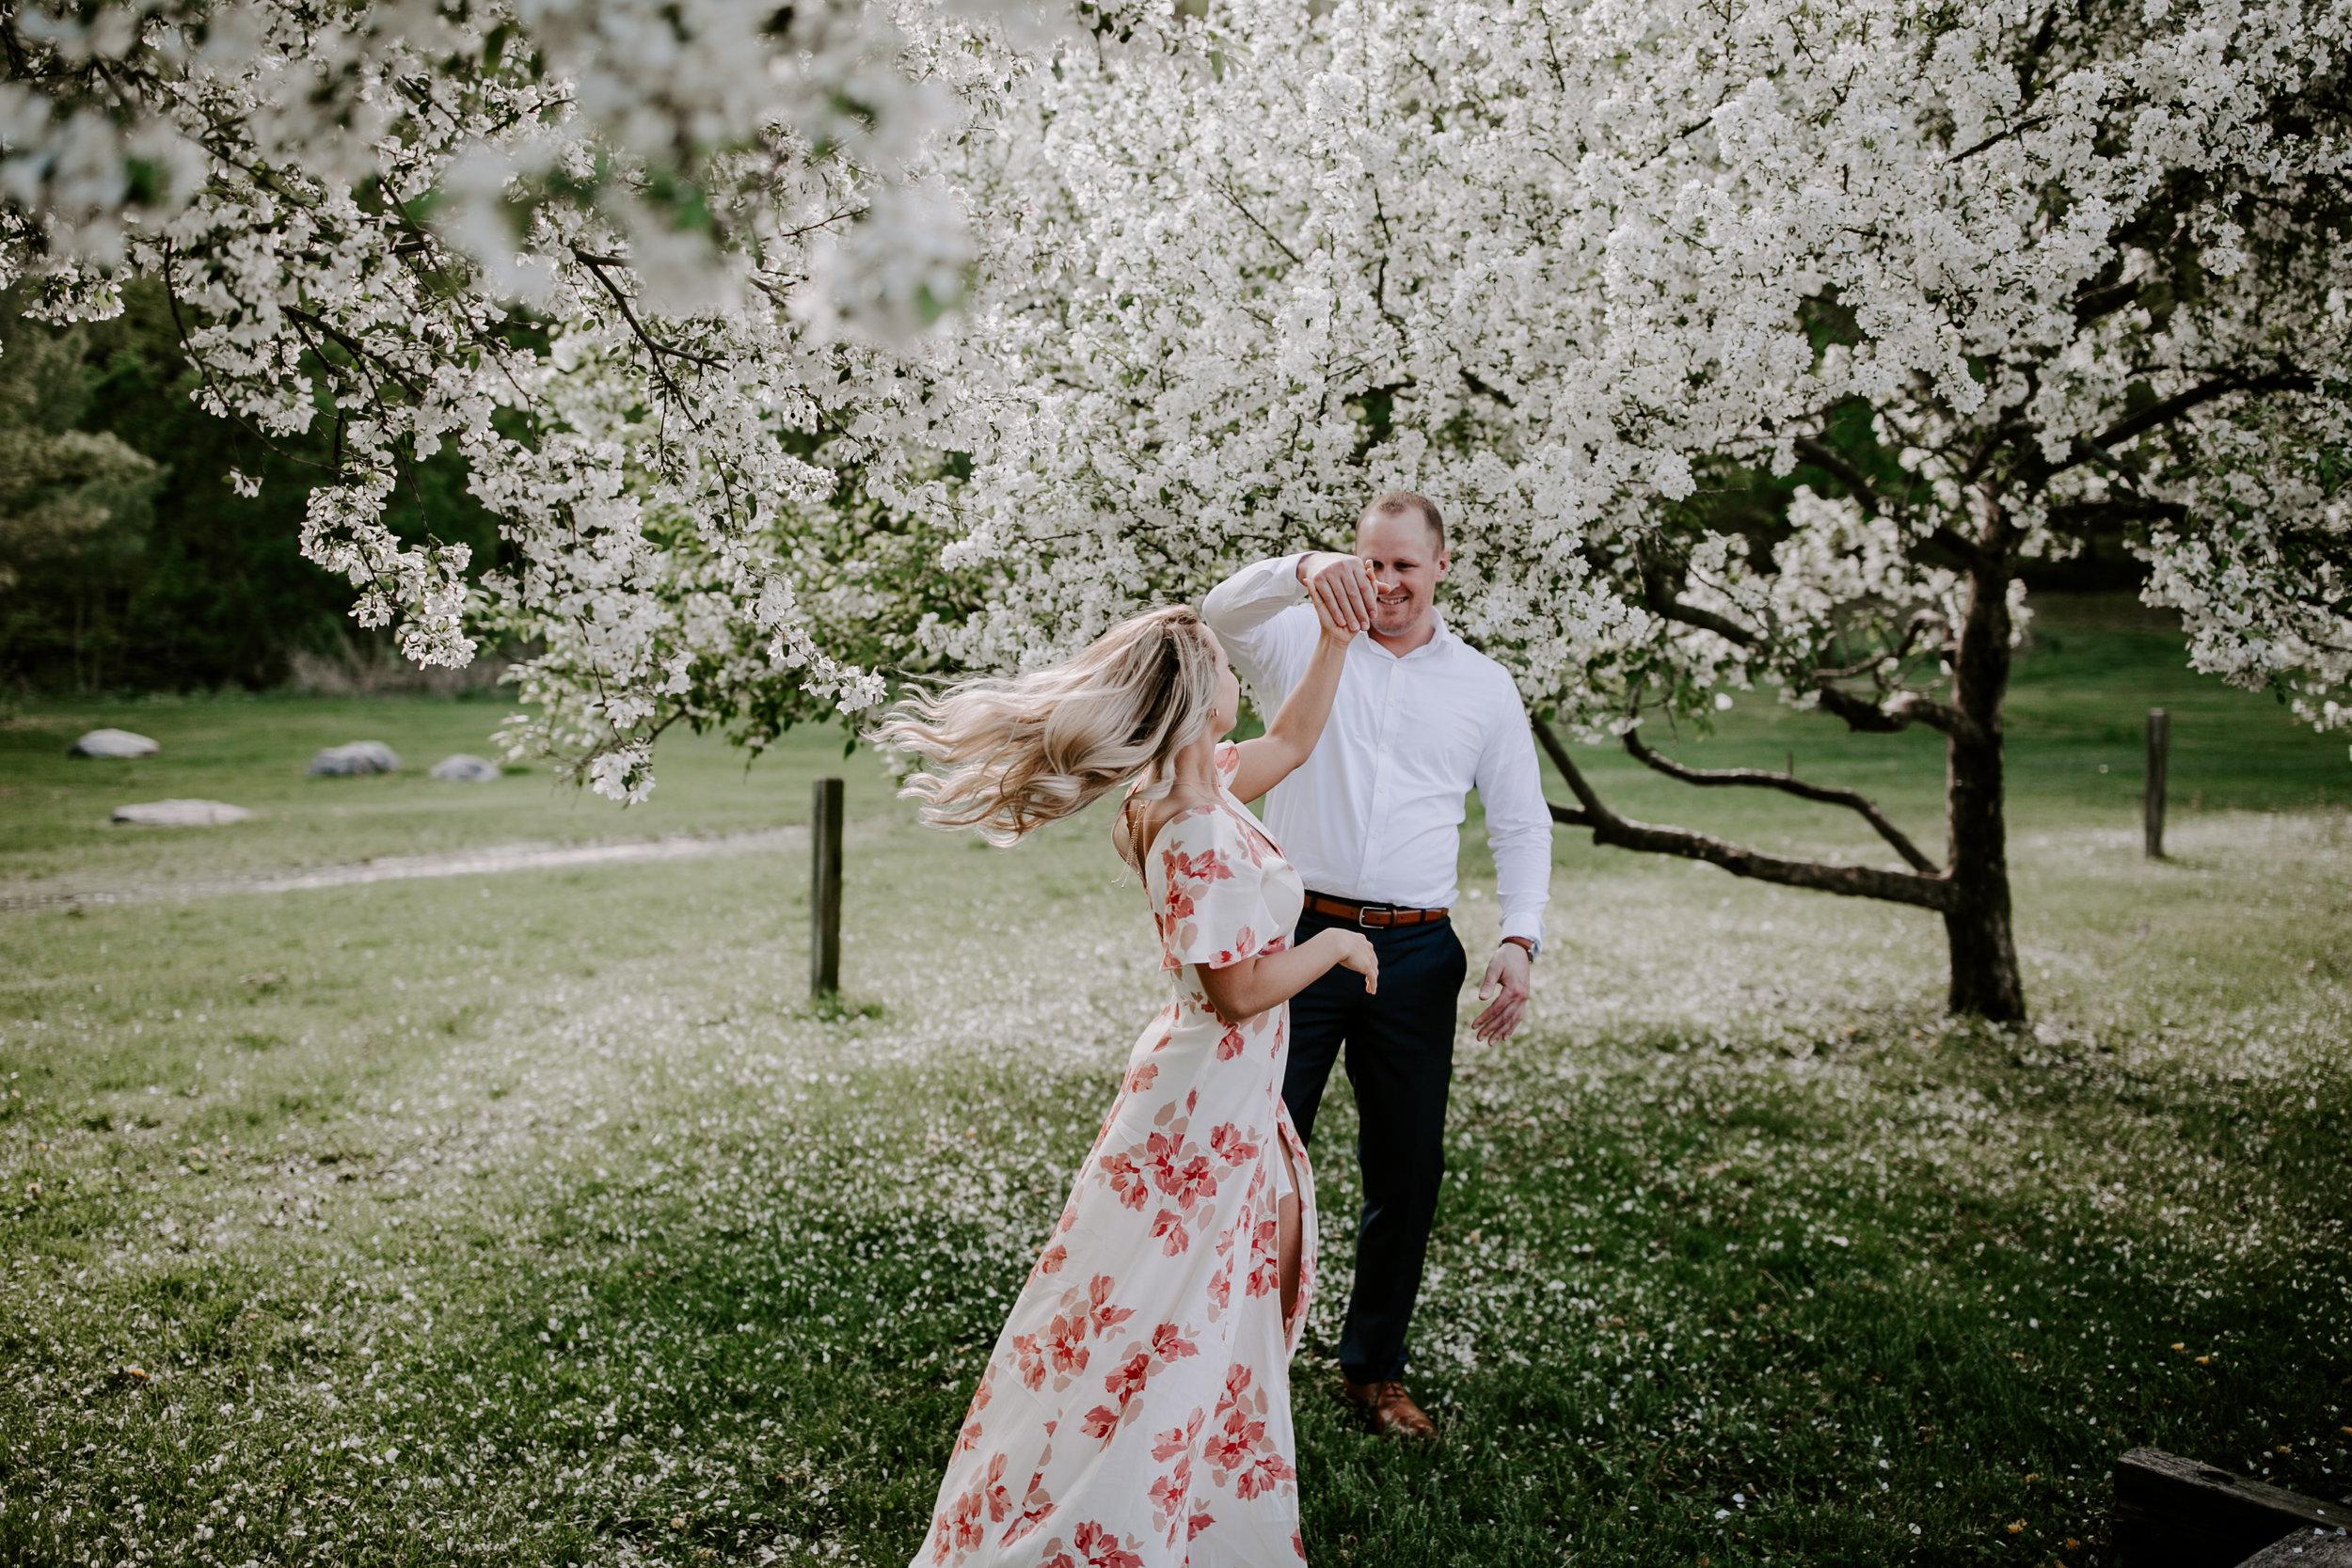 gracetphotography-wedding-photographer-adventure-bride-engagement-midwest-18.jpg